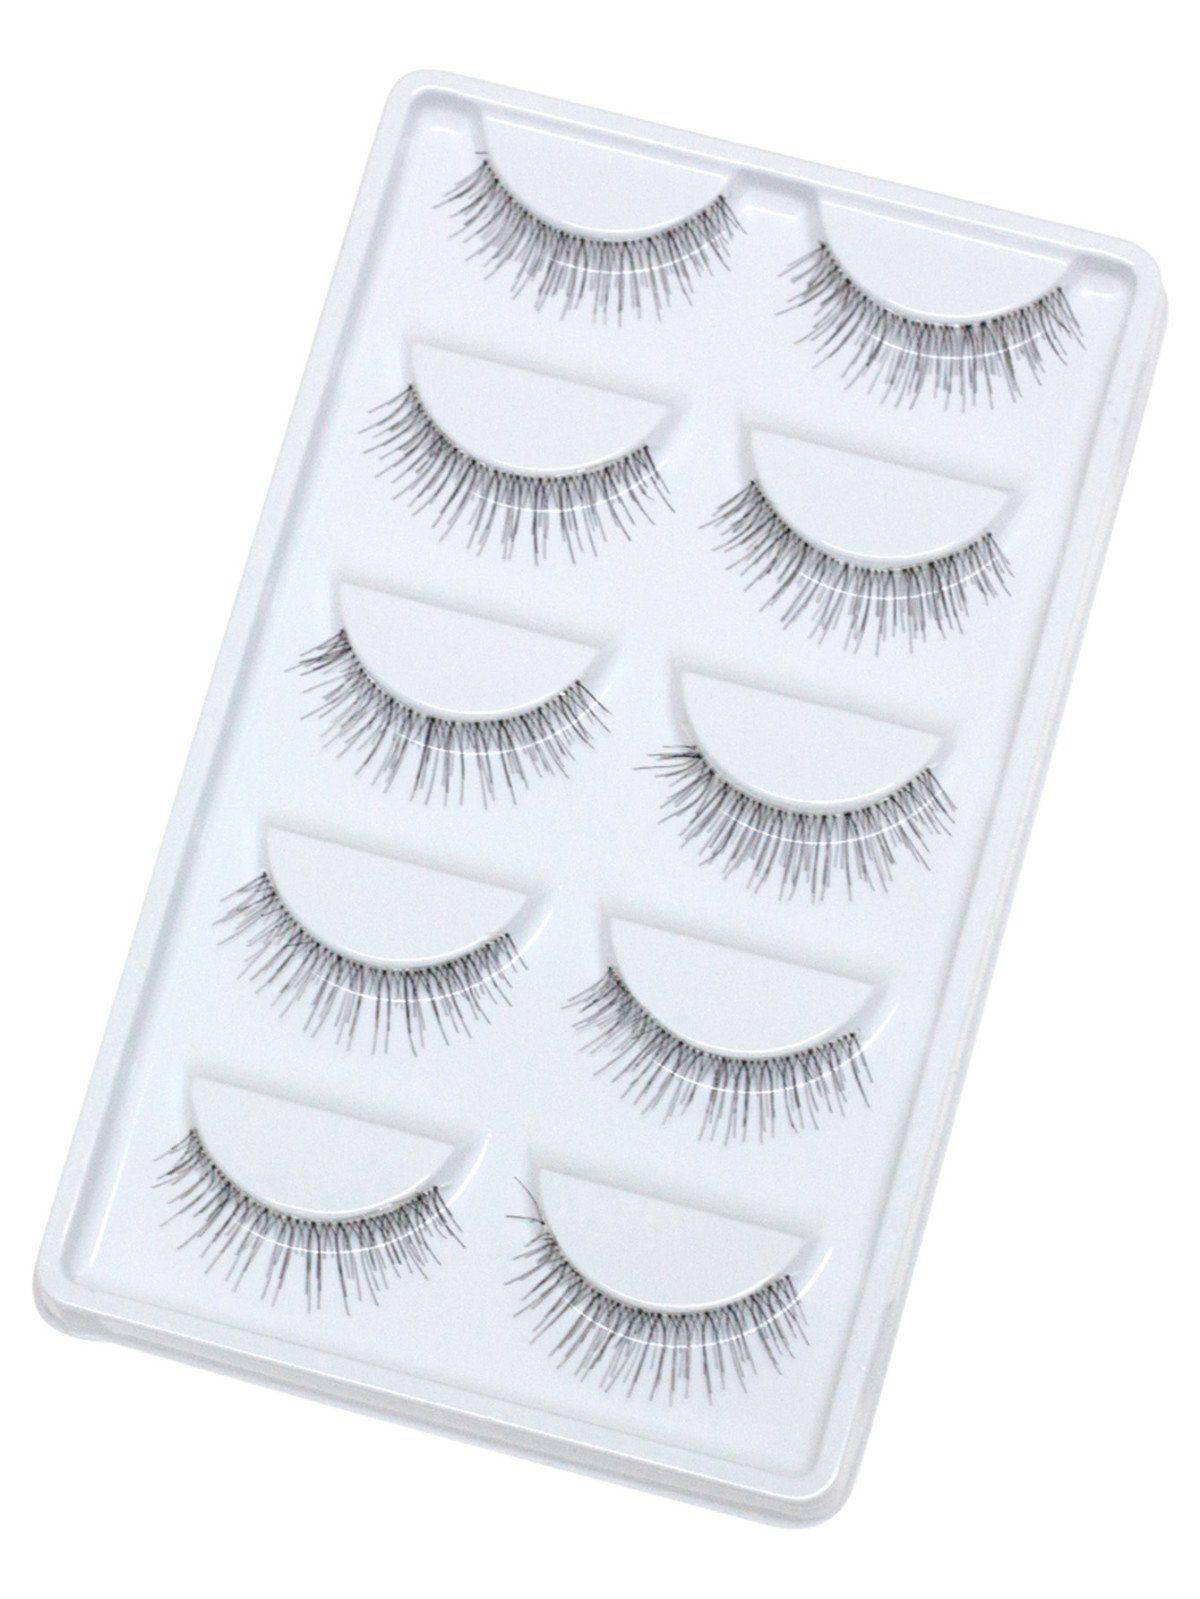 Makeup Tools by BORNTOWEAR. False Eyelashes 5 Pair